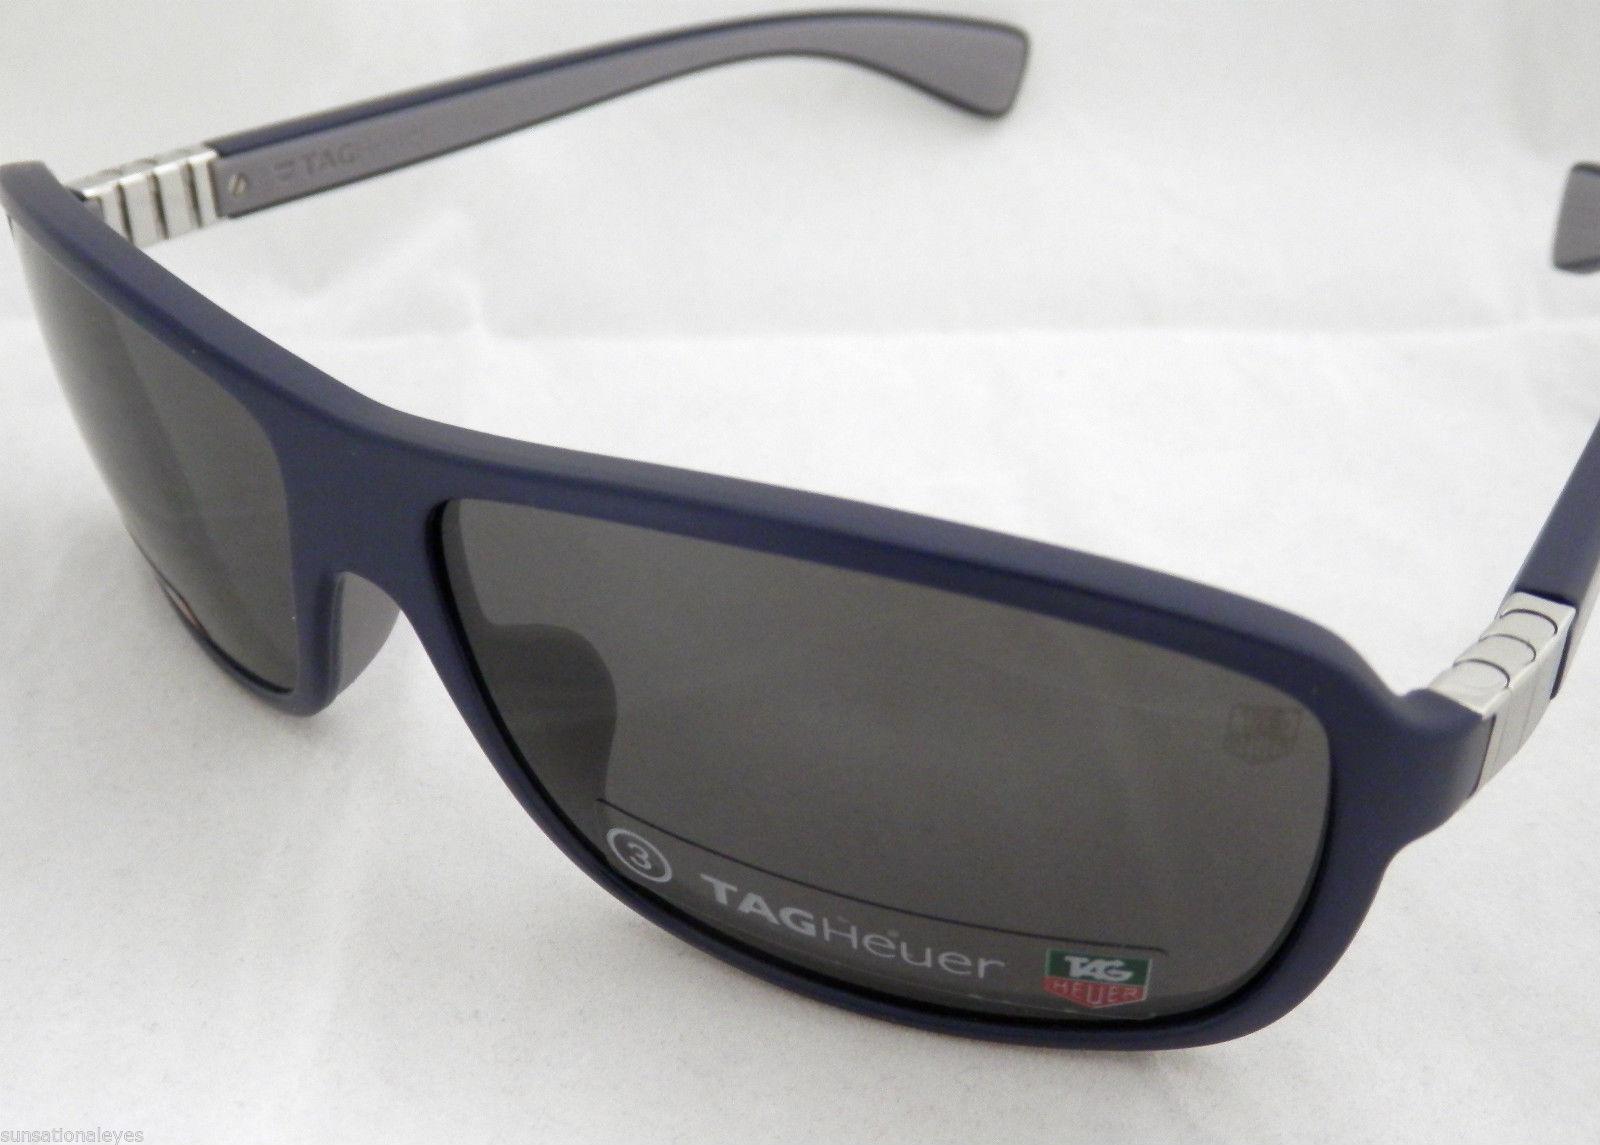 lunettes de soleil tag heuer urban legend th9302 104 taille 63 13 tag heuer ol9199 ol 39 optic. Black Bedroom Furniture Sets. Home Design Ideas